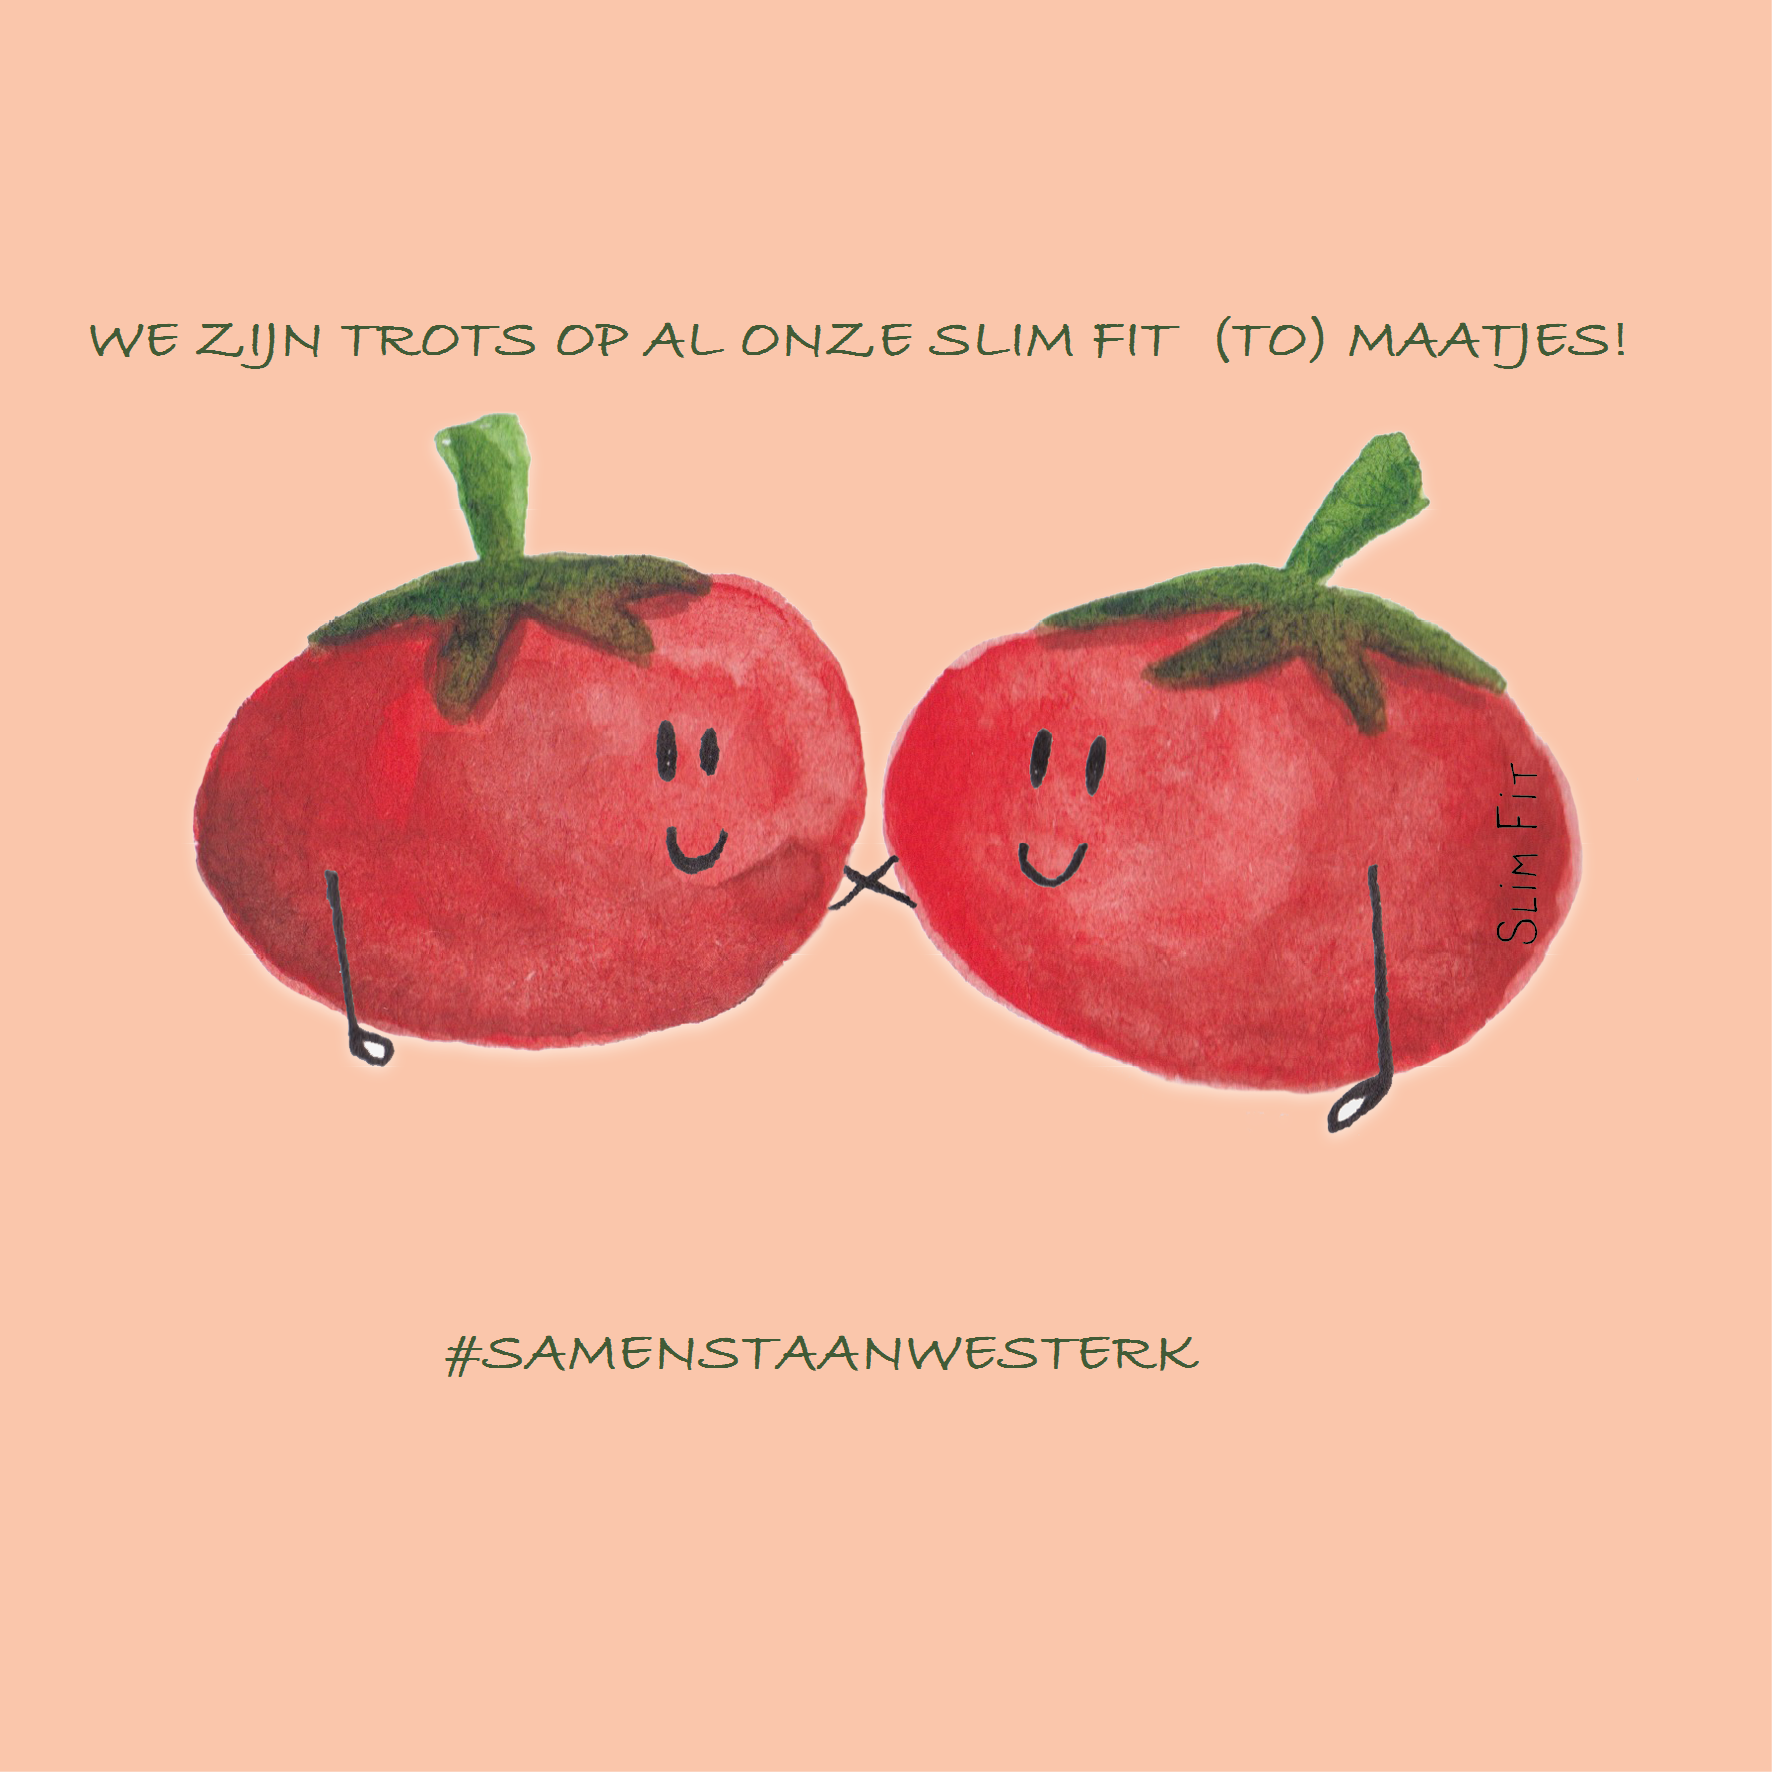 coronavirus-tomaatjes-slim-fit-samen-staan-we-sterk1.png